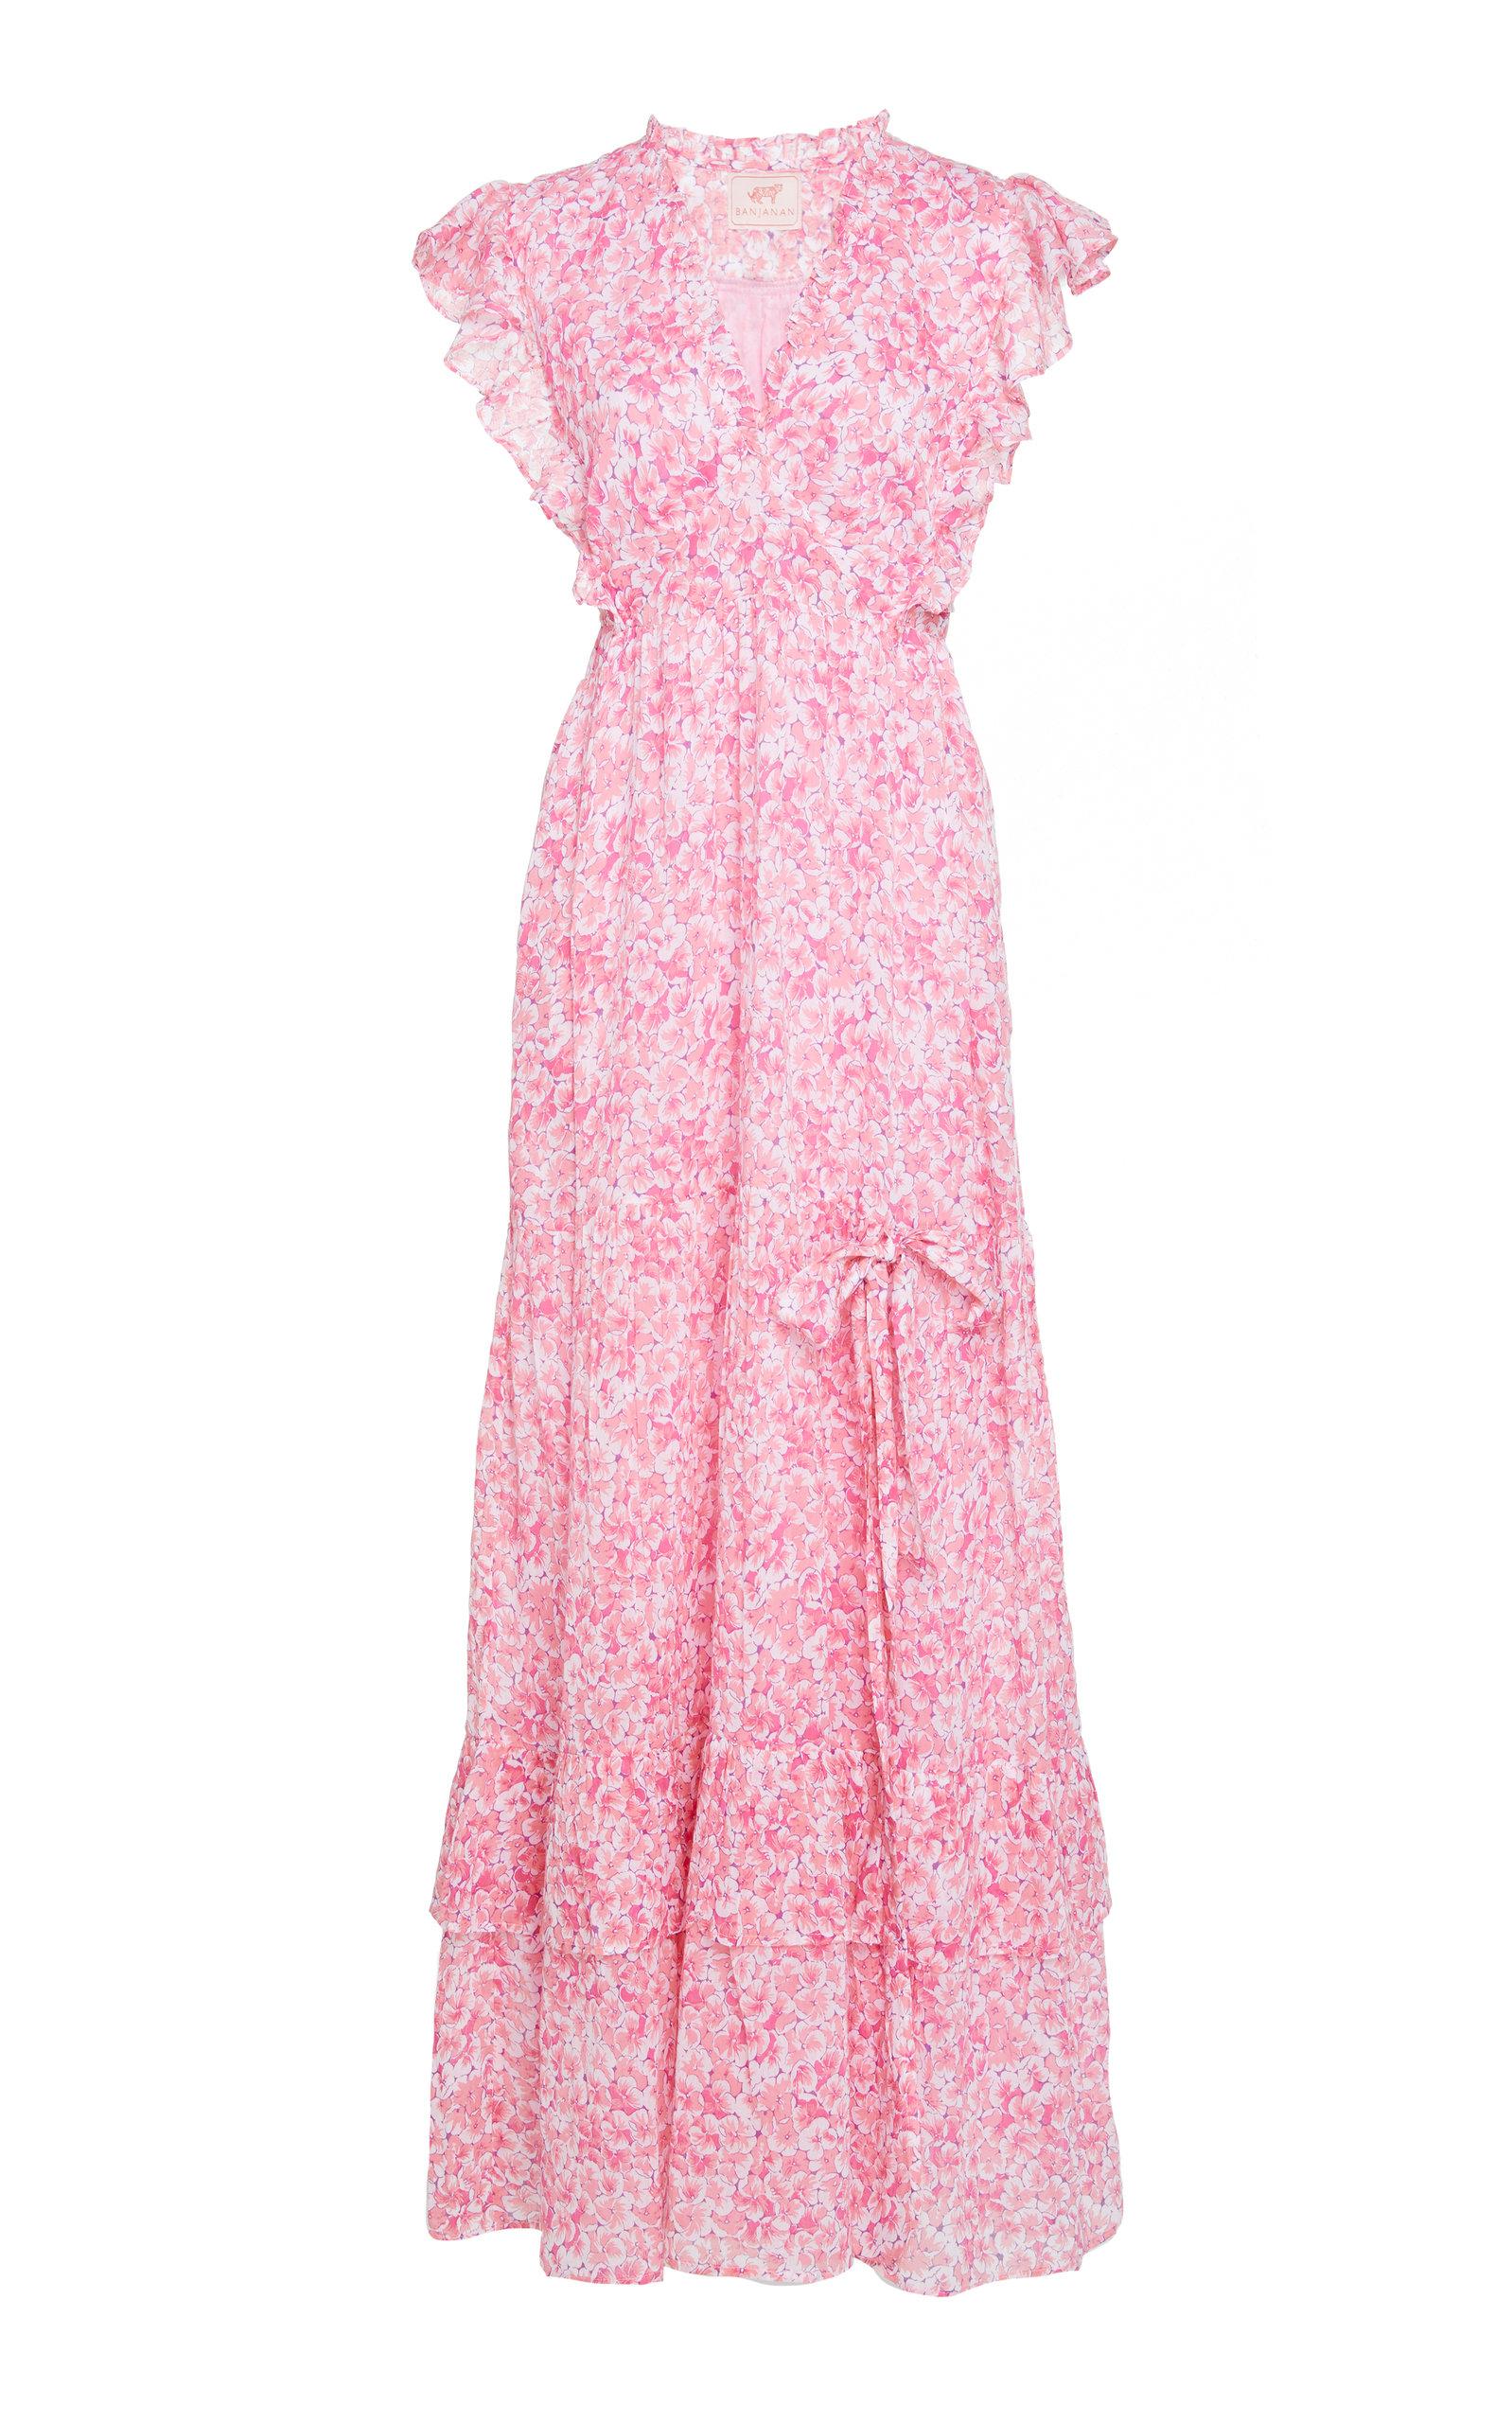 Buy Banjanan Gabriela Floral-Printed Cotton Dress online, shop Banjanan at the best price